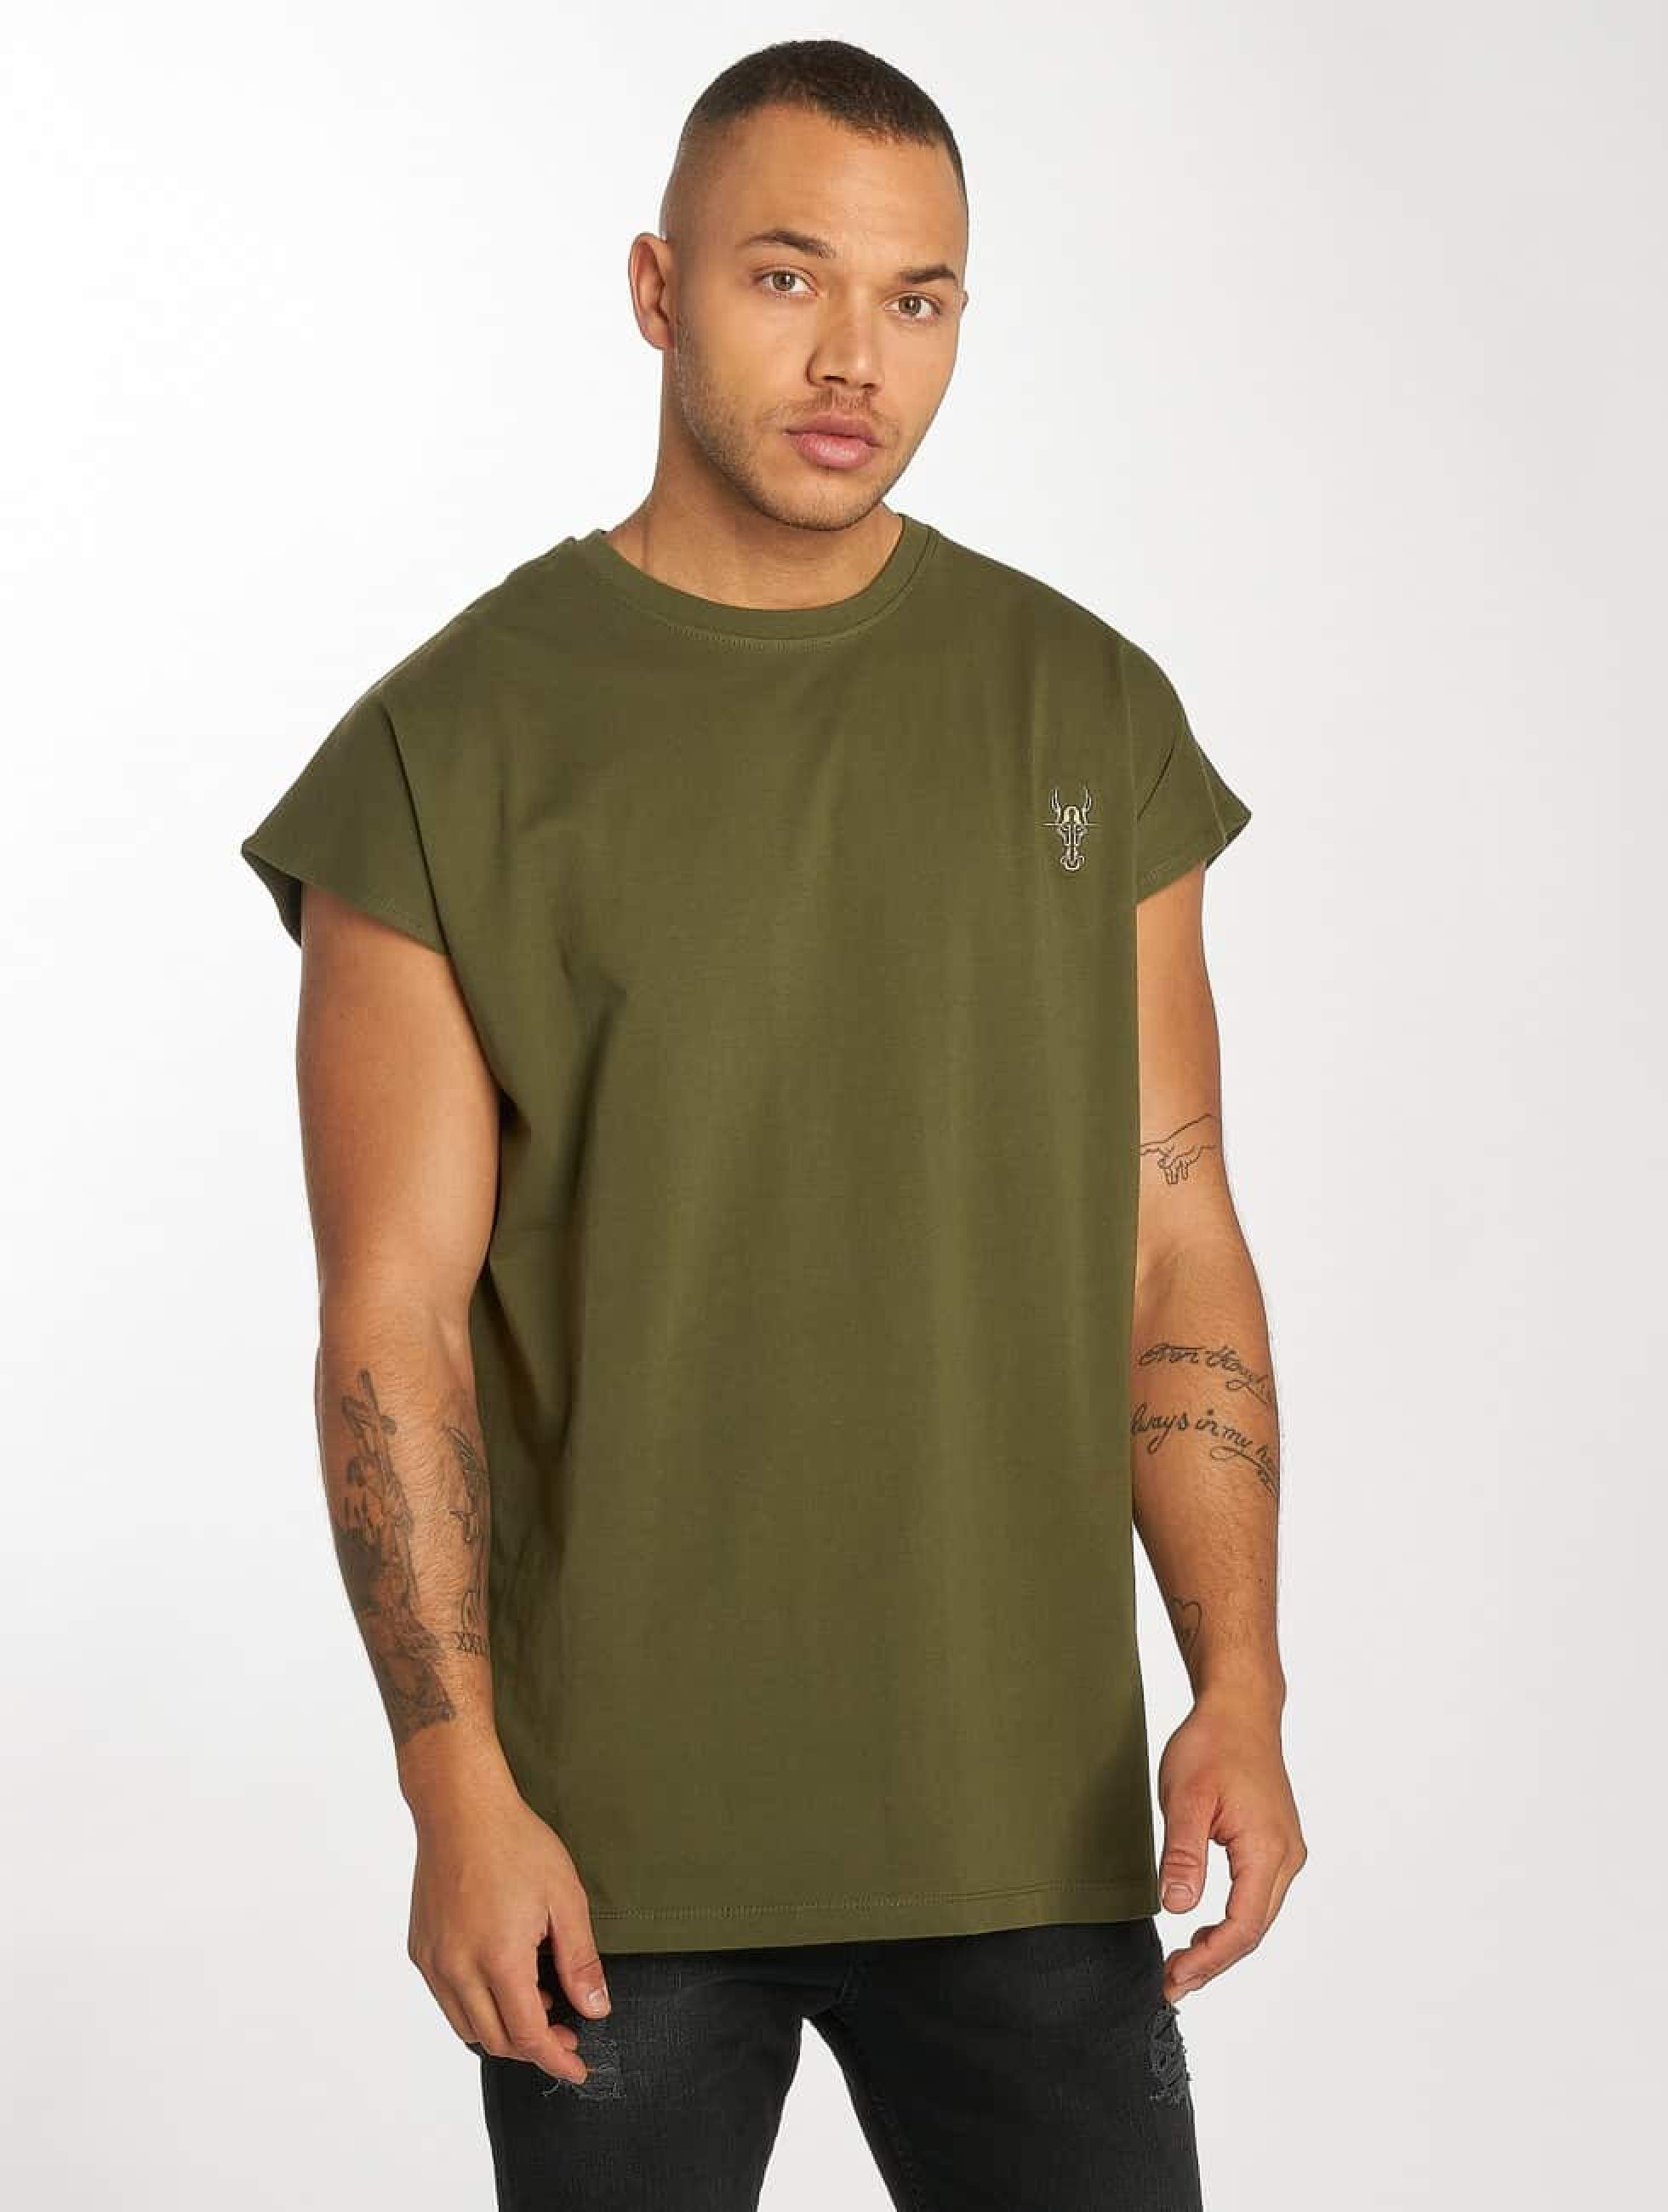 De Ferro / T-Shirt Bat Sleeve in olive S